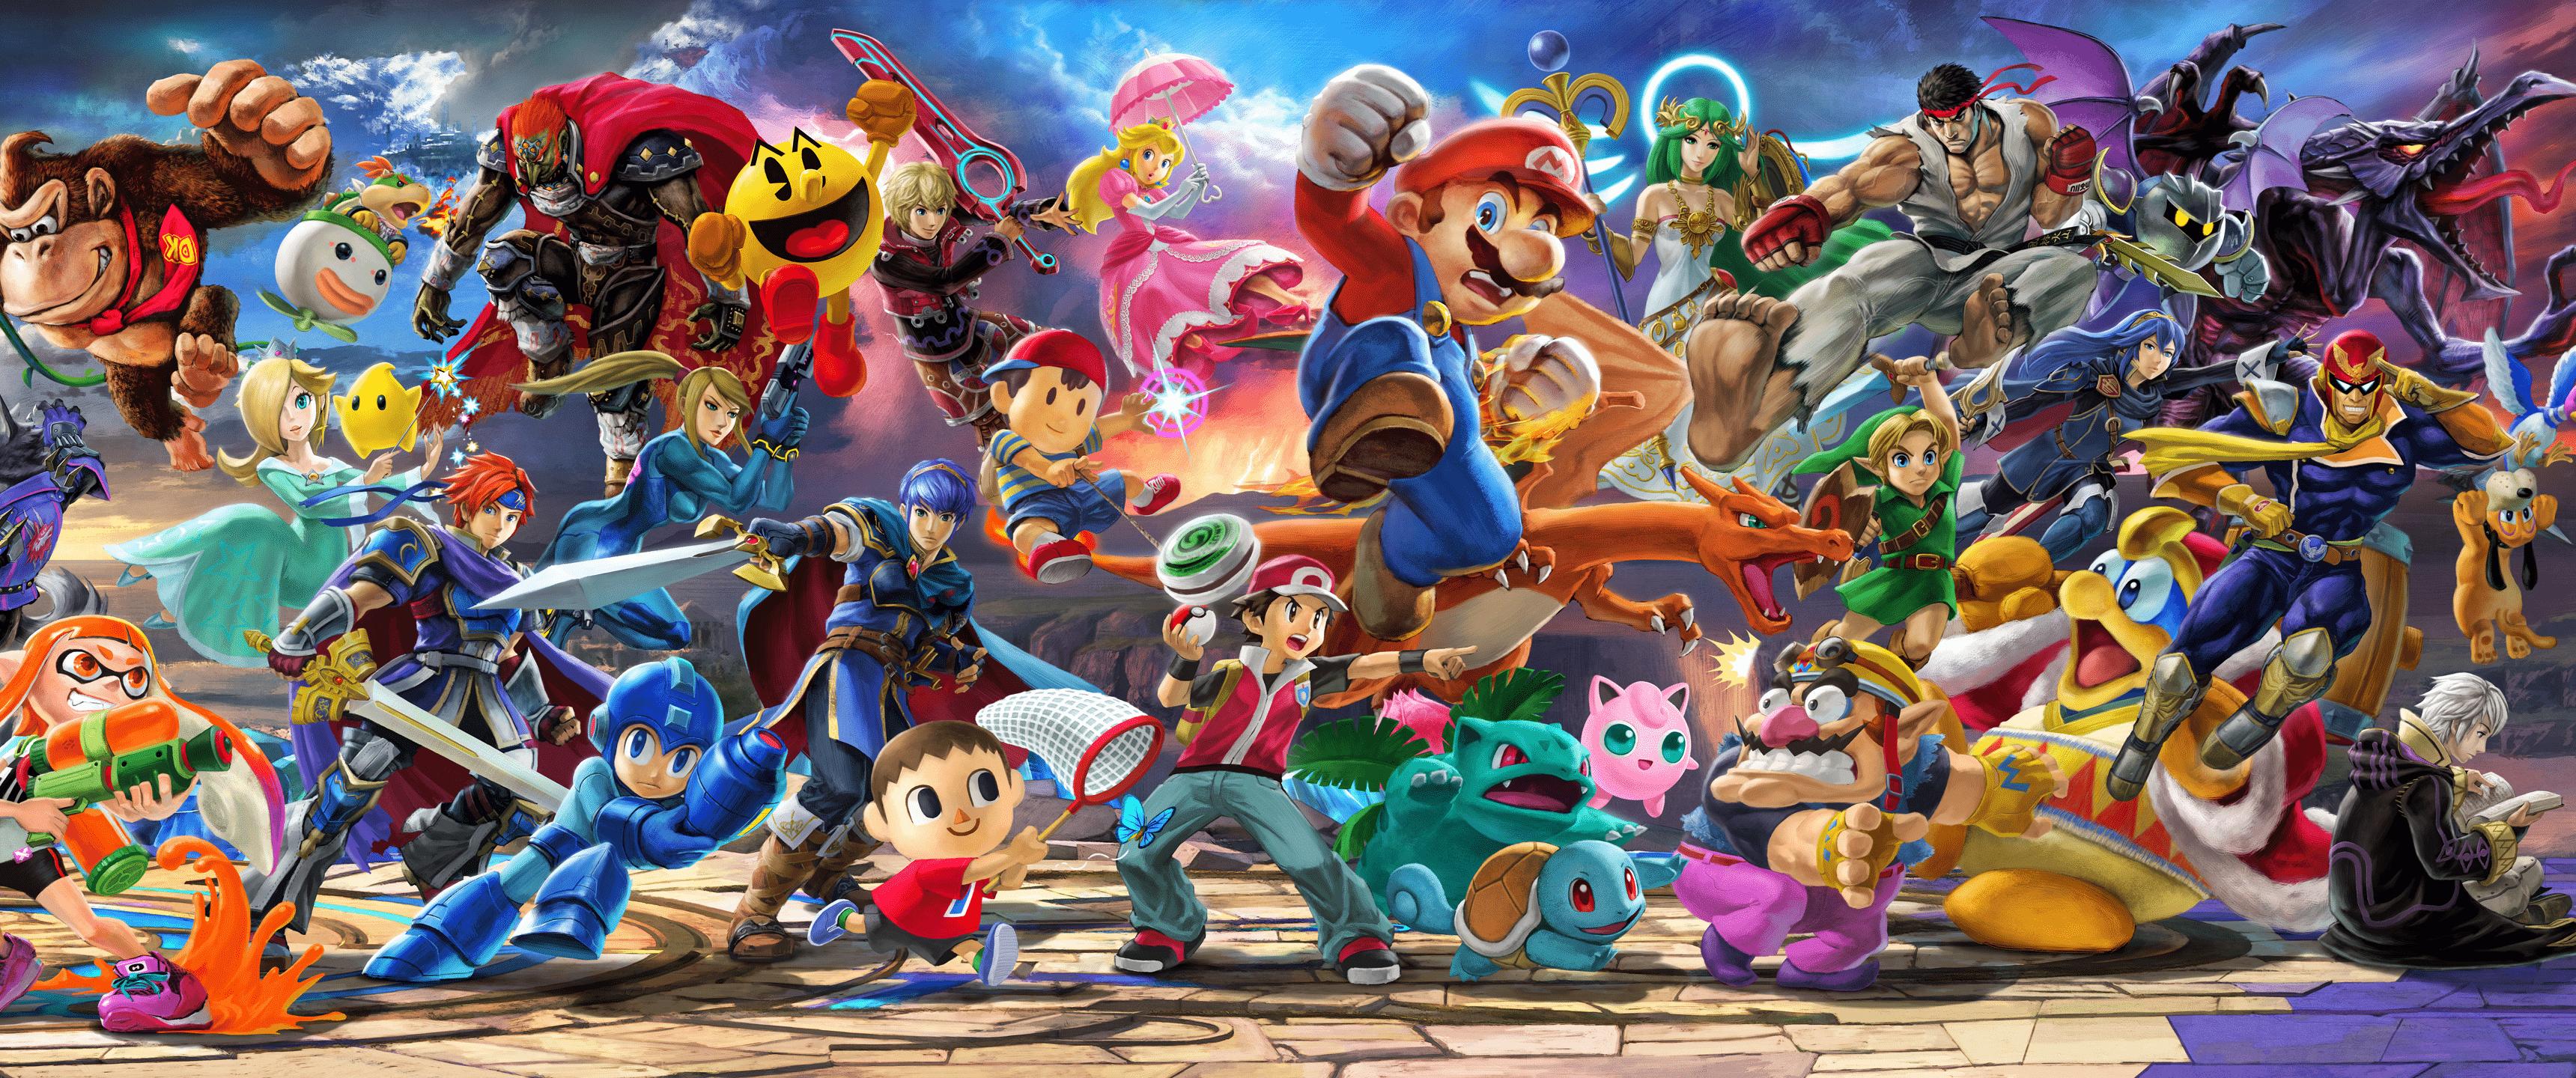 Smash Bros Ultimate Wallpapers - Top Free Smash Bros ...